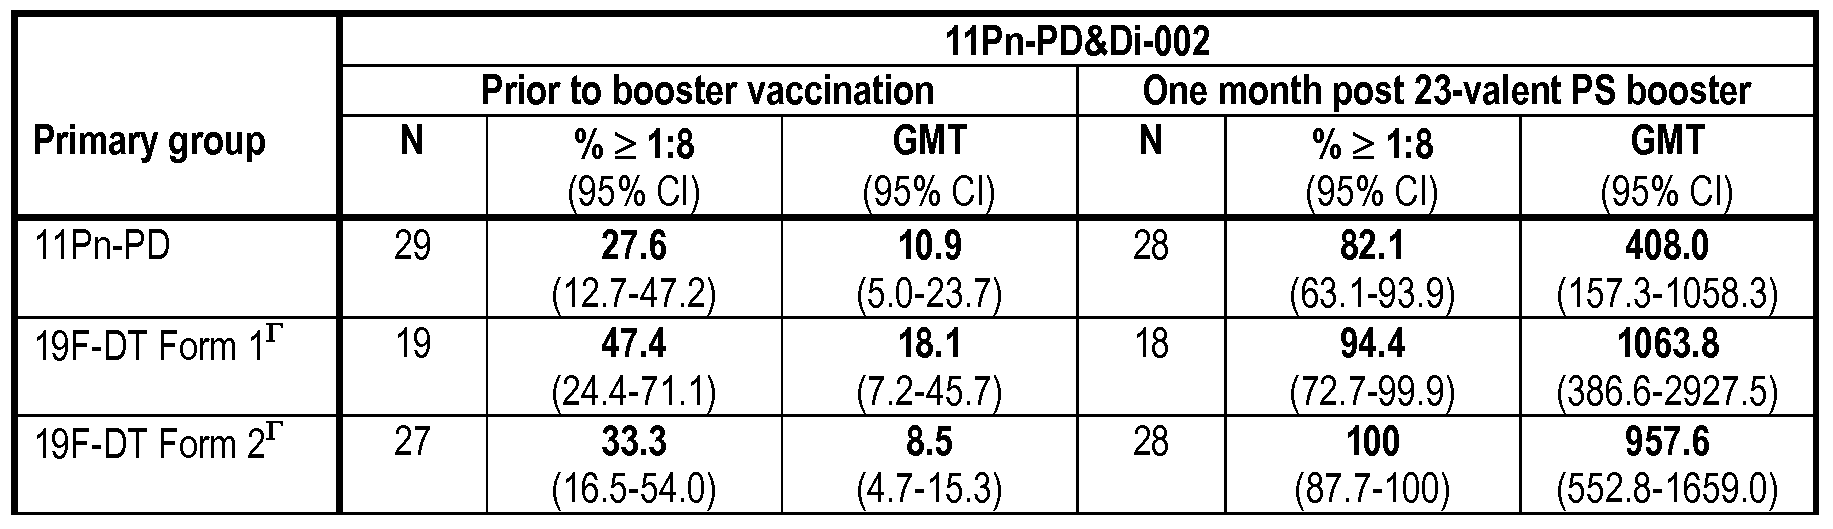 Wo2009000826a1 Vaccine Comprising Streptococcus Pneumoniae